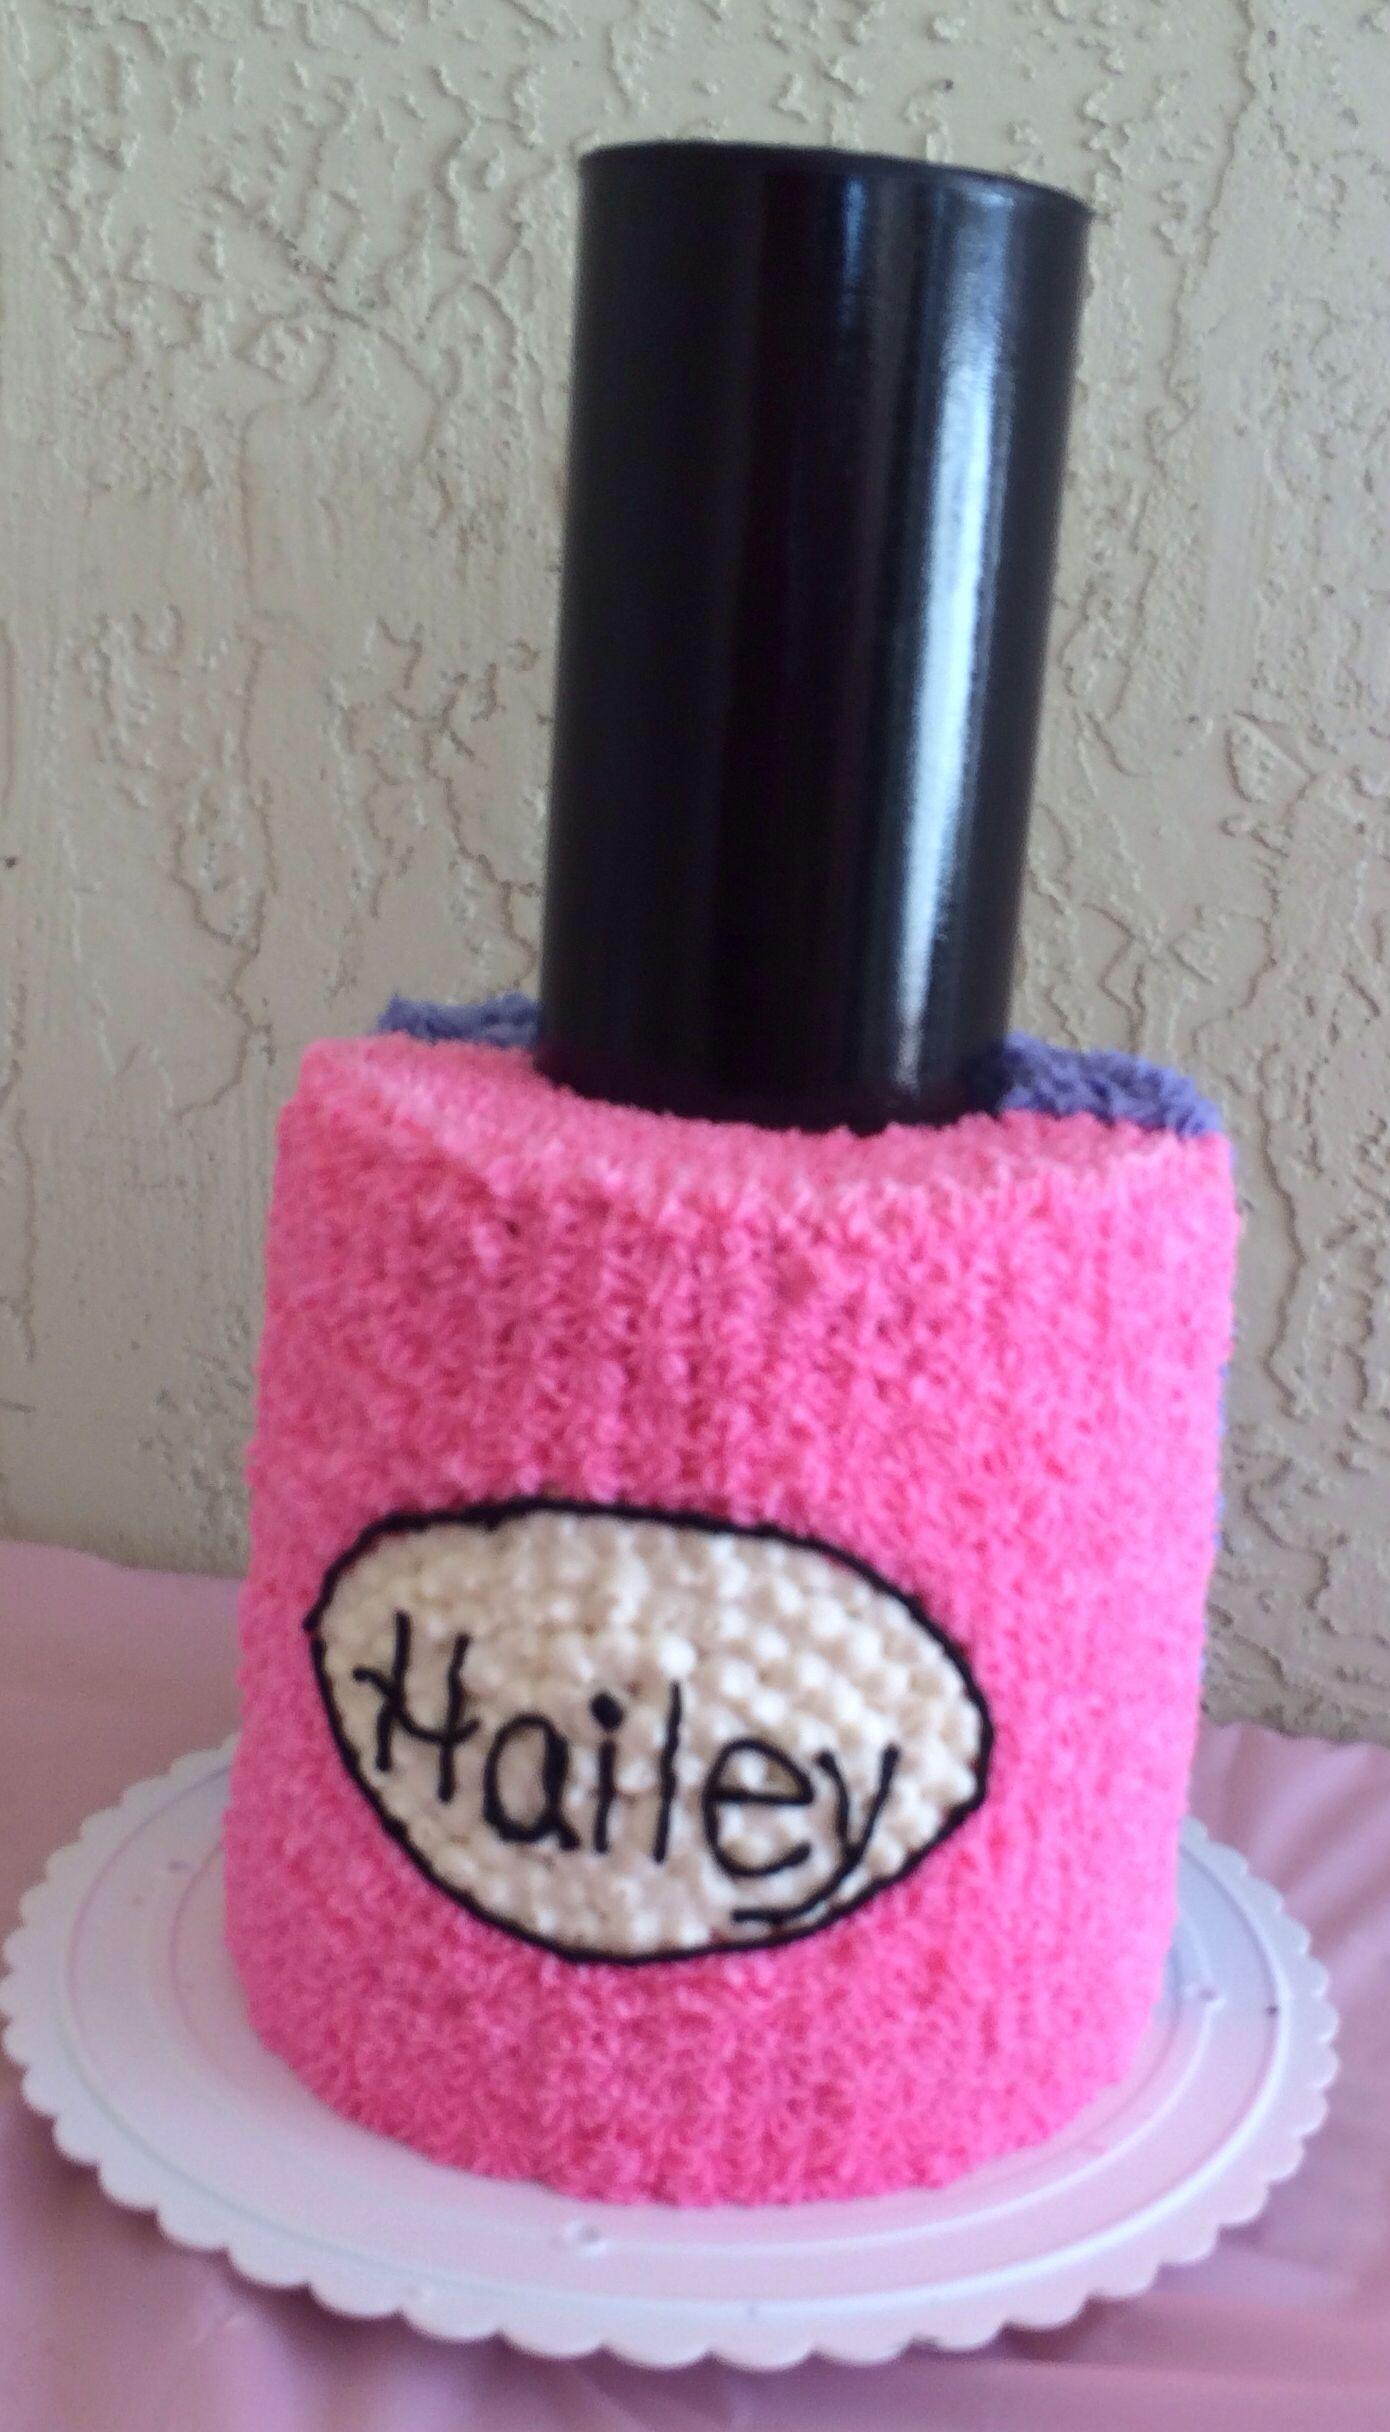 Nail Polish Bottle Childrens Cakes